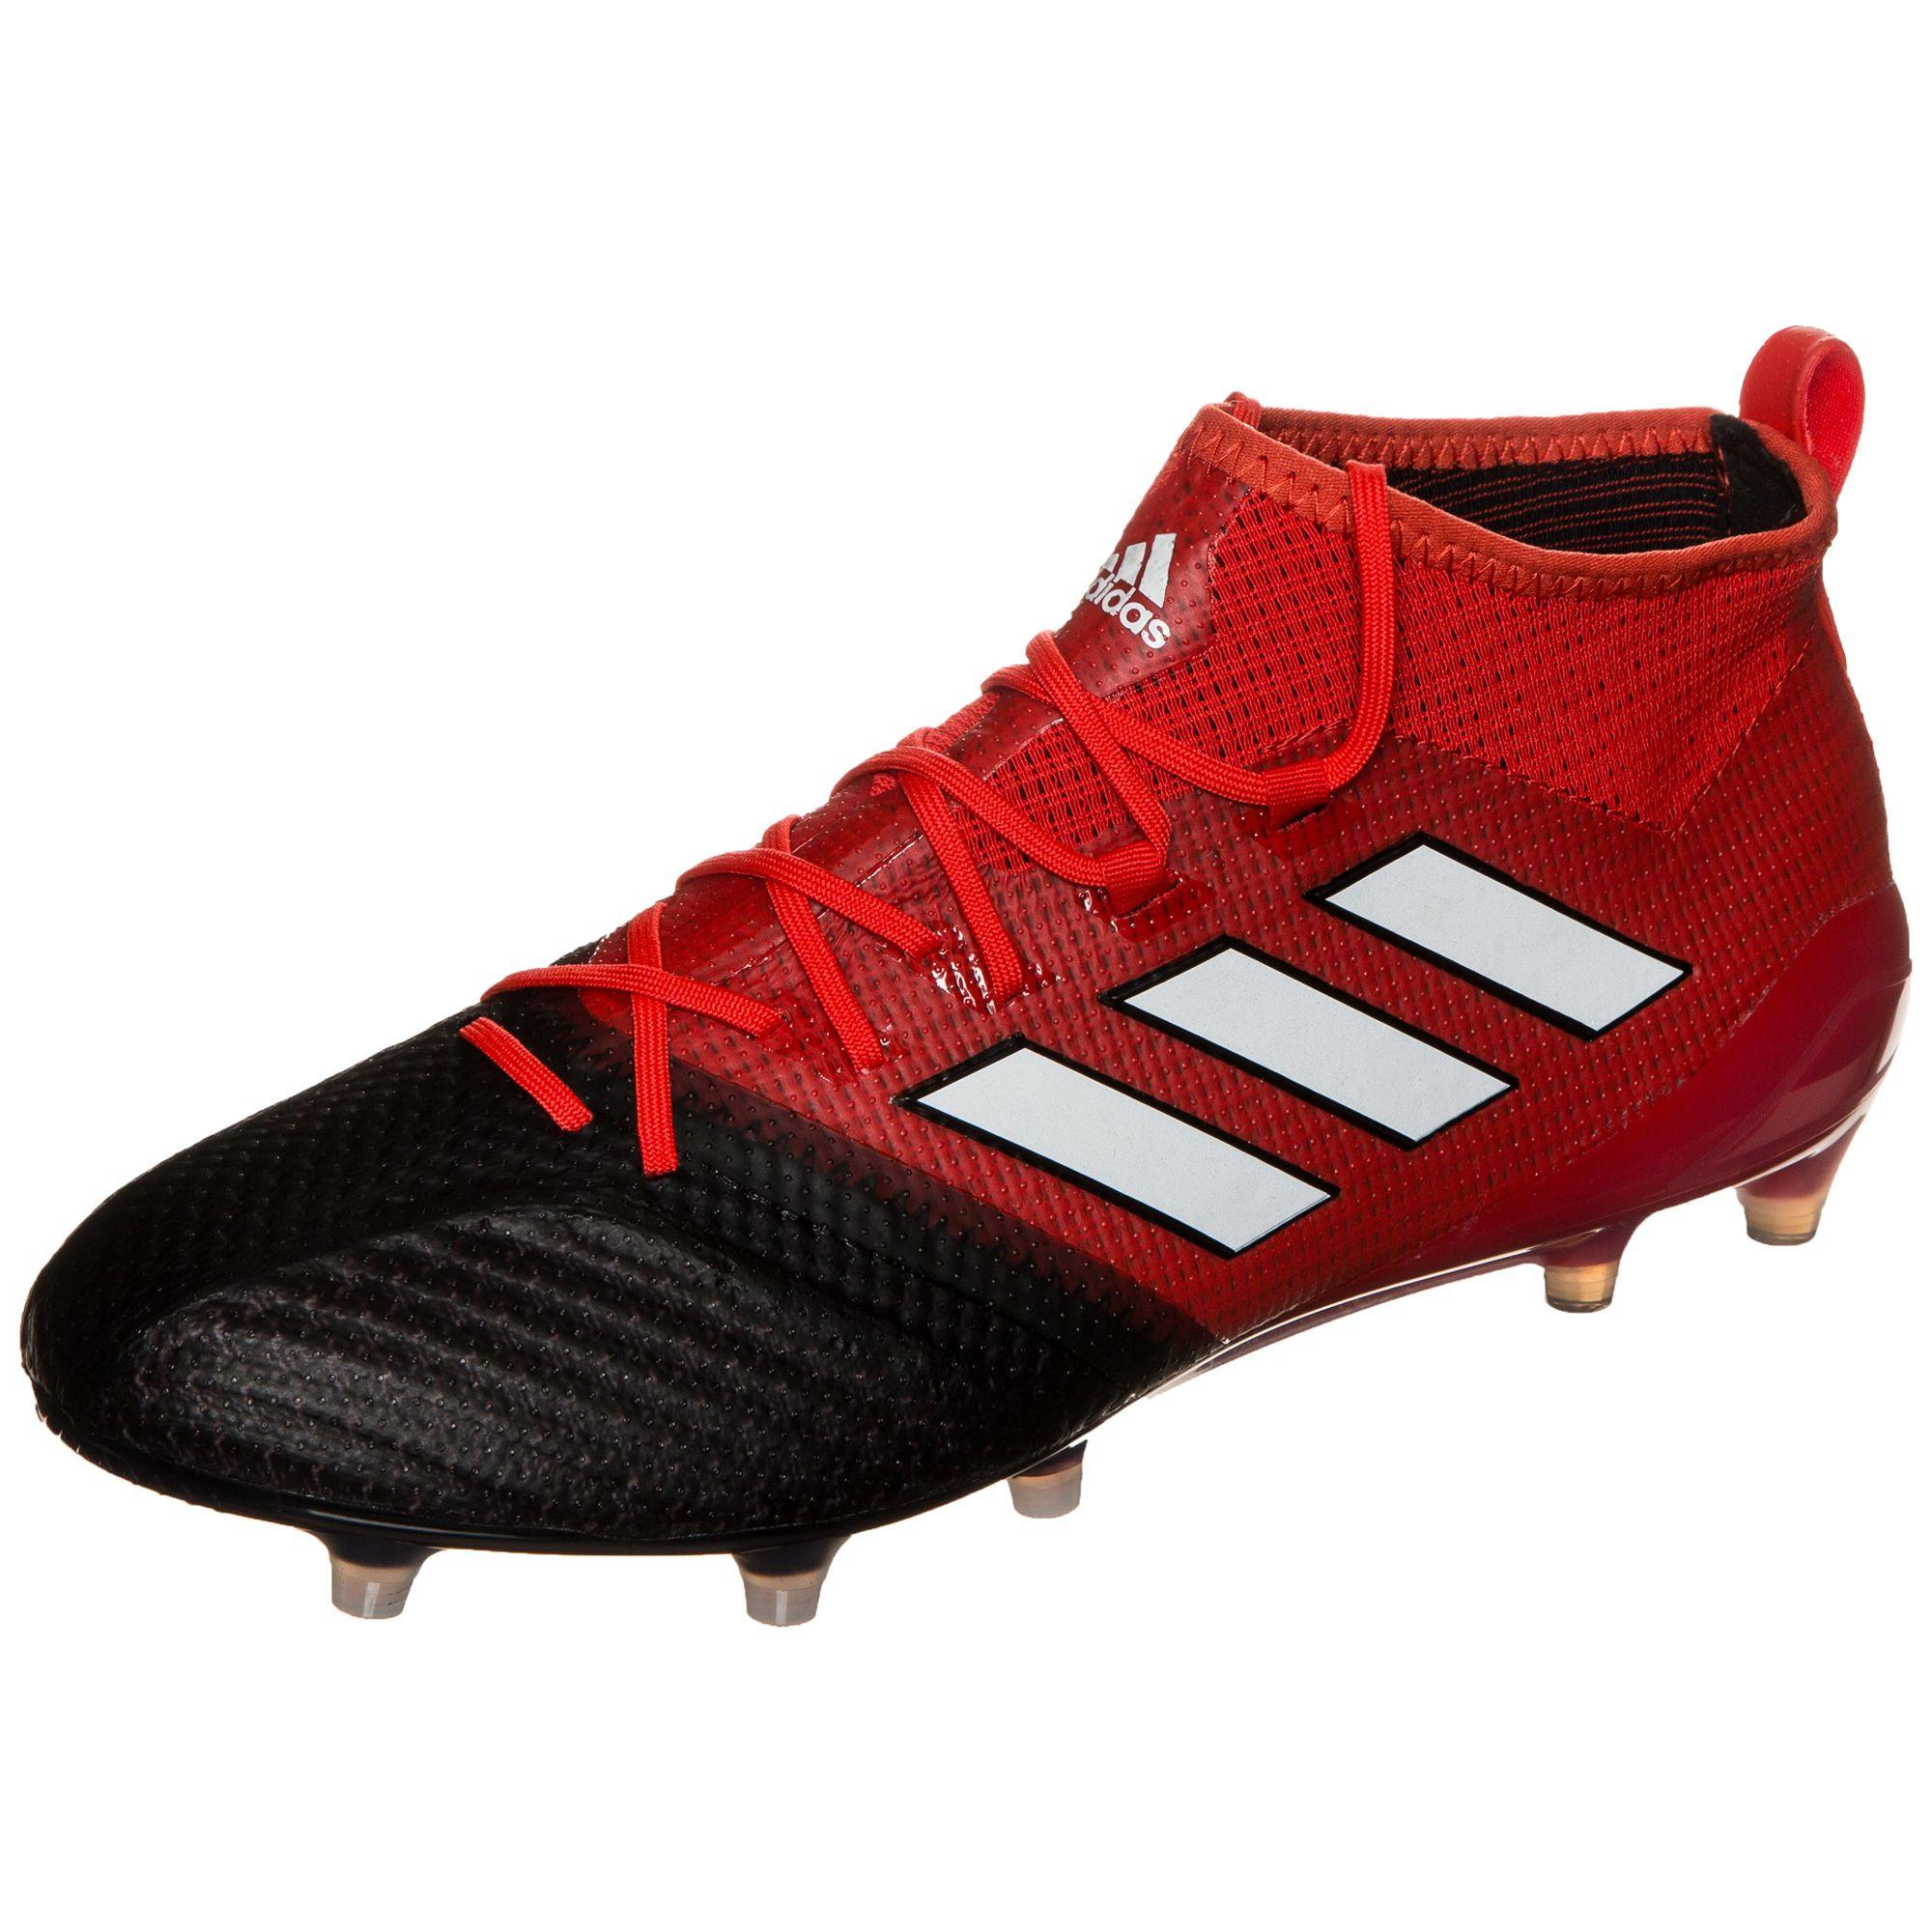 ADIDAS PERFORMANCE adidas Performance ACE 17.1 Primeknit FG Fußballschuh Herren